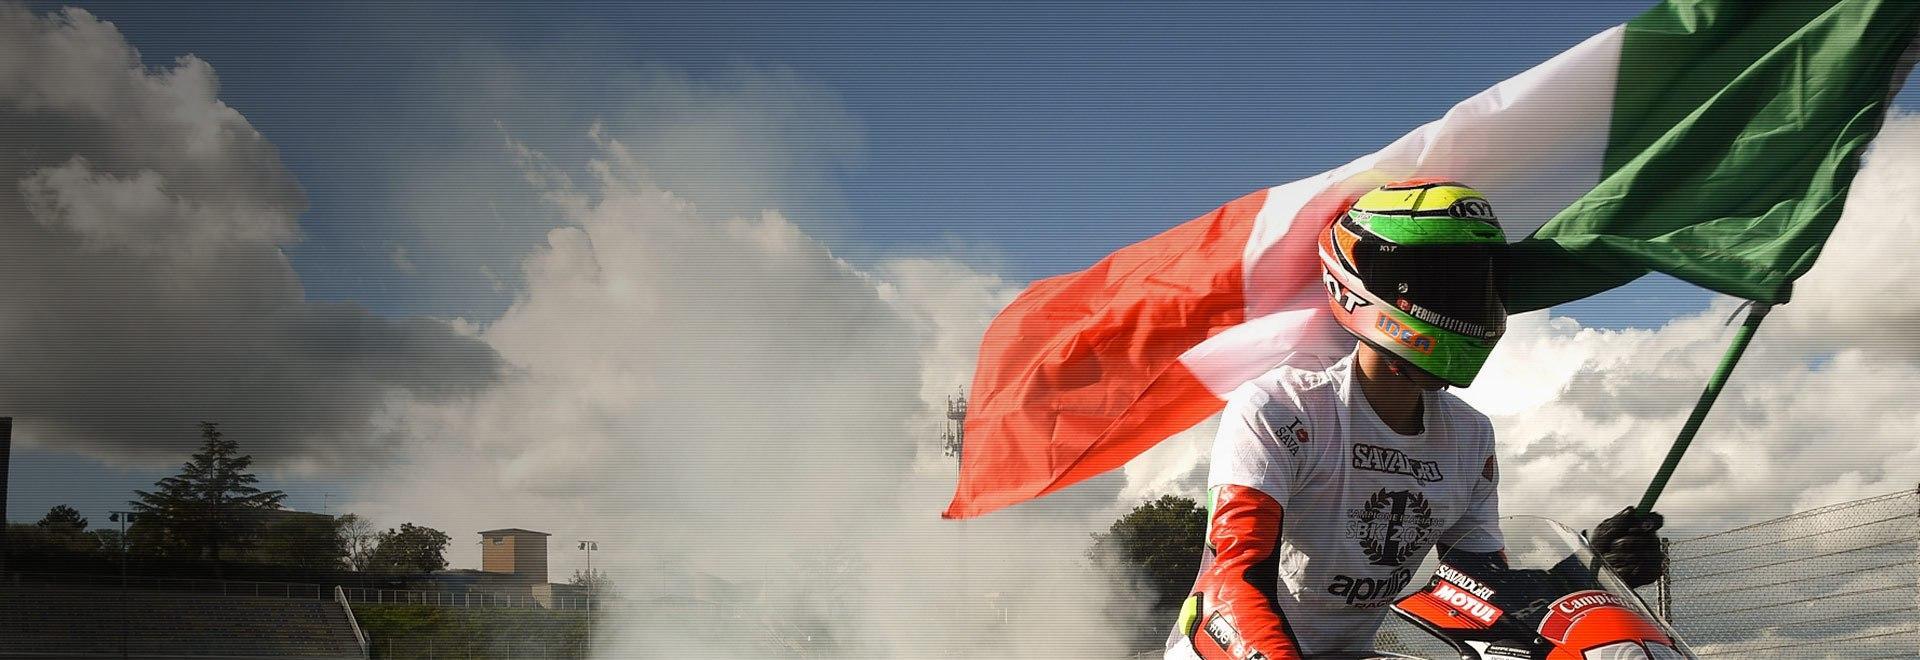 GP Misano: Moto3. Race 1